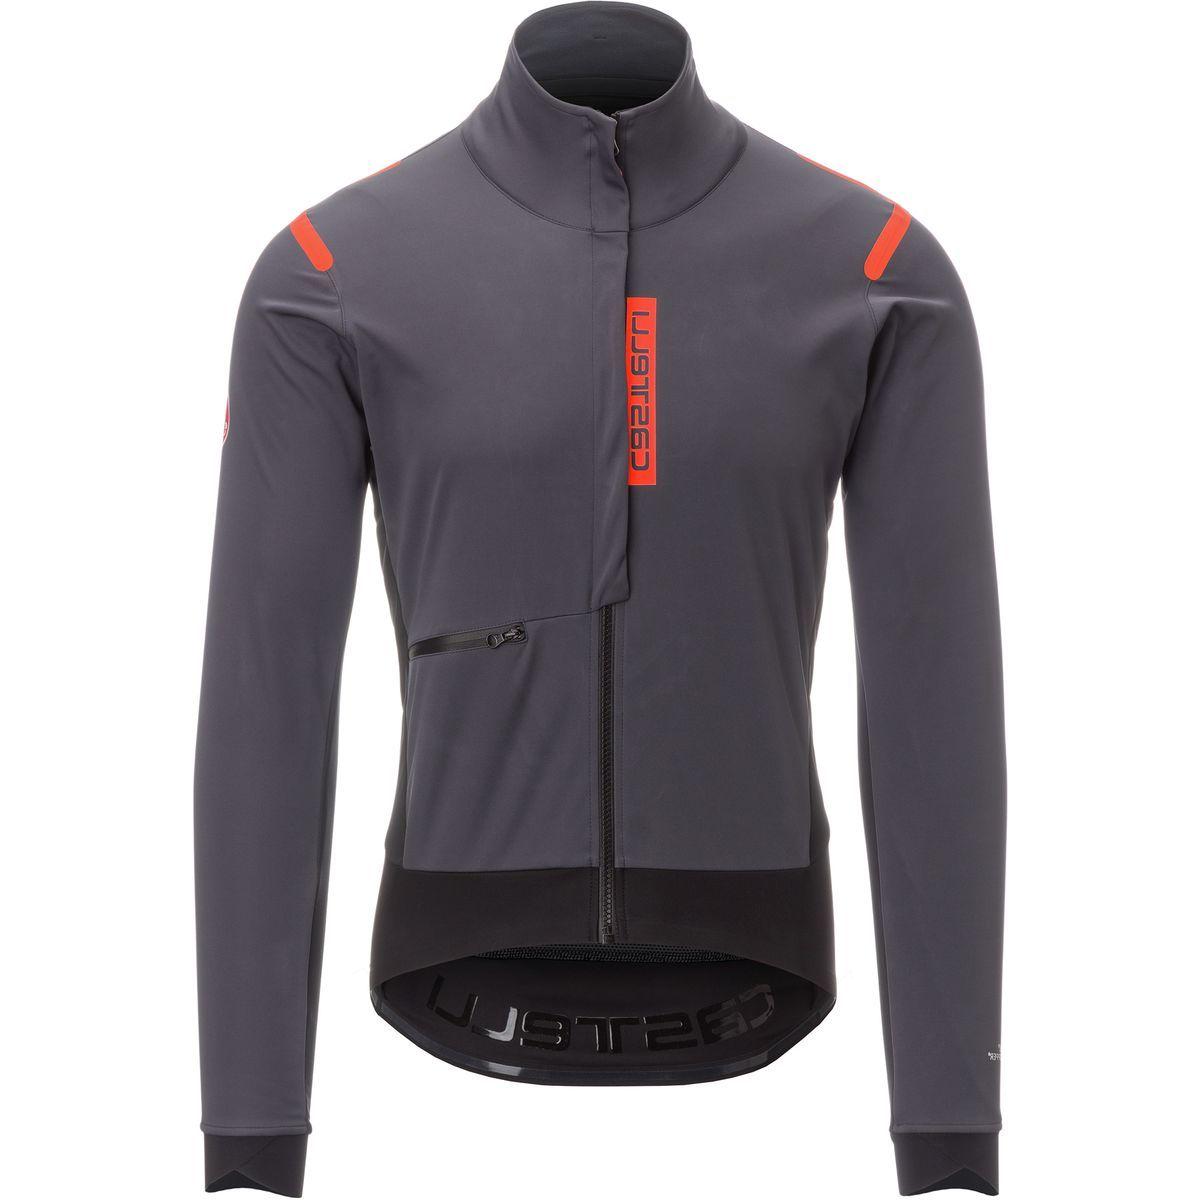 Castelli Alpha ROS Jacket- Limited Edition - Men's